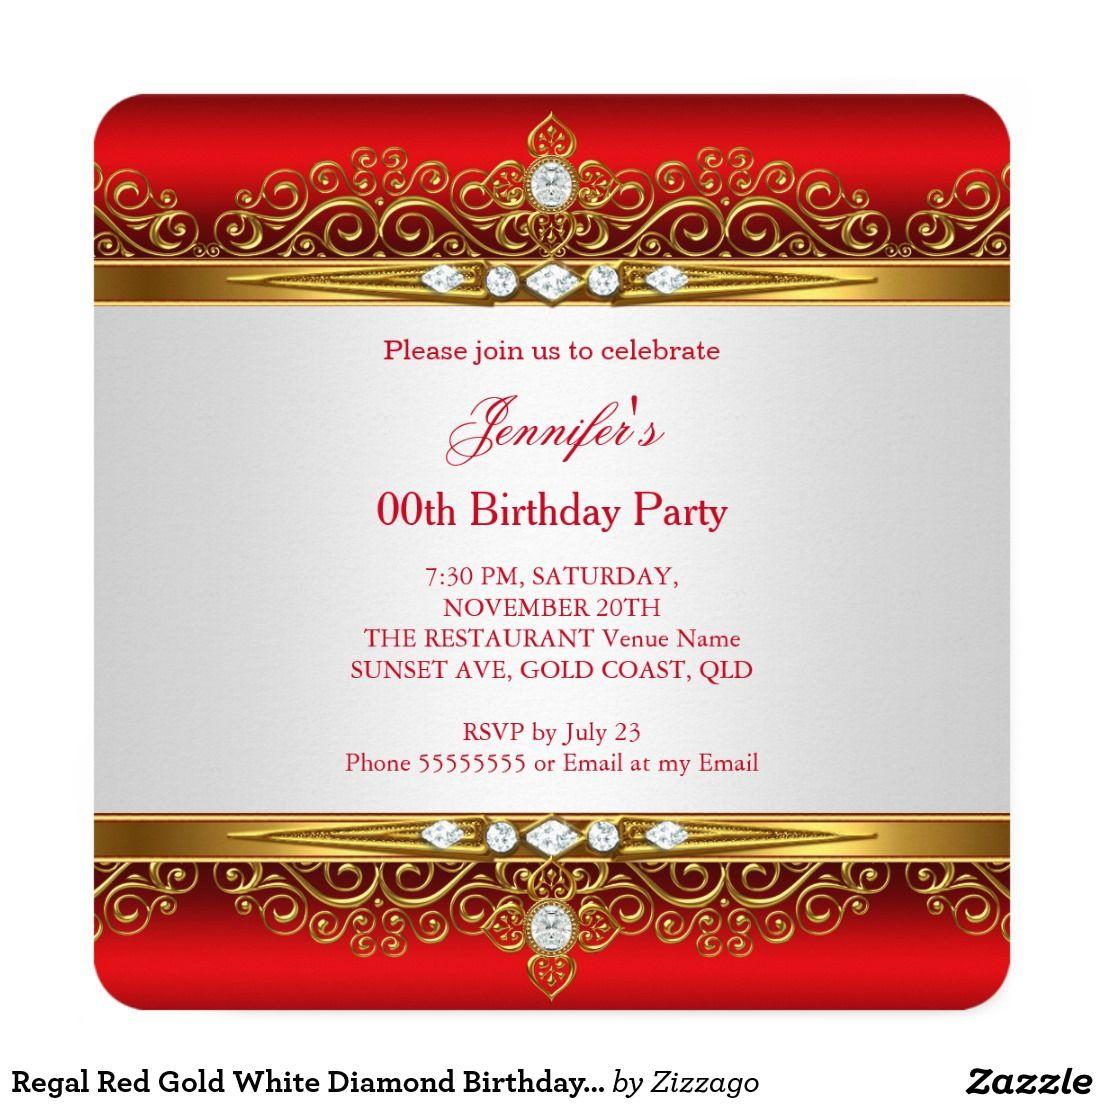 Regal Red Gold White Diamond Birthday Party Invitation